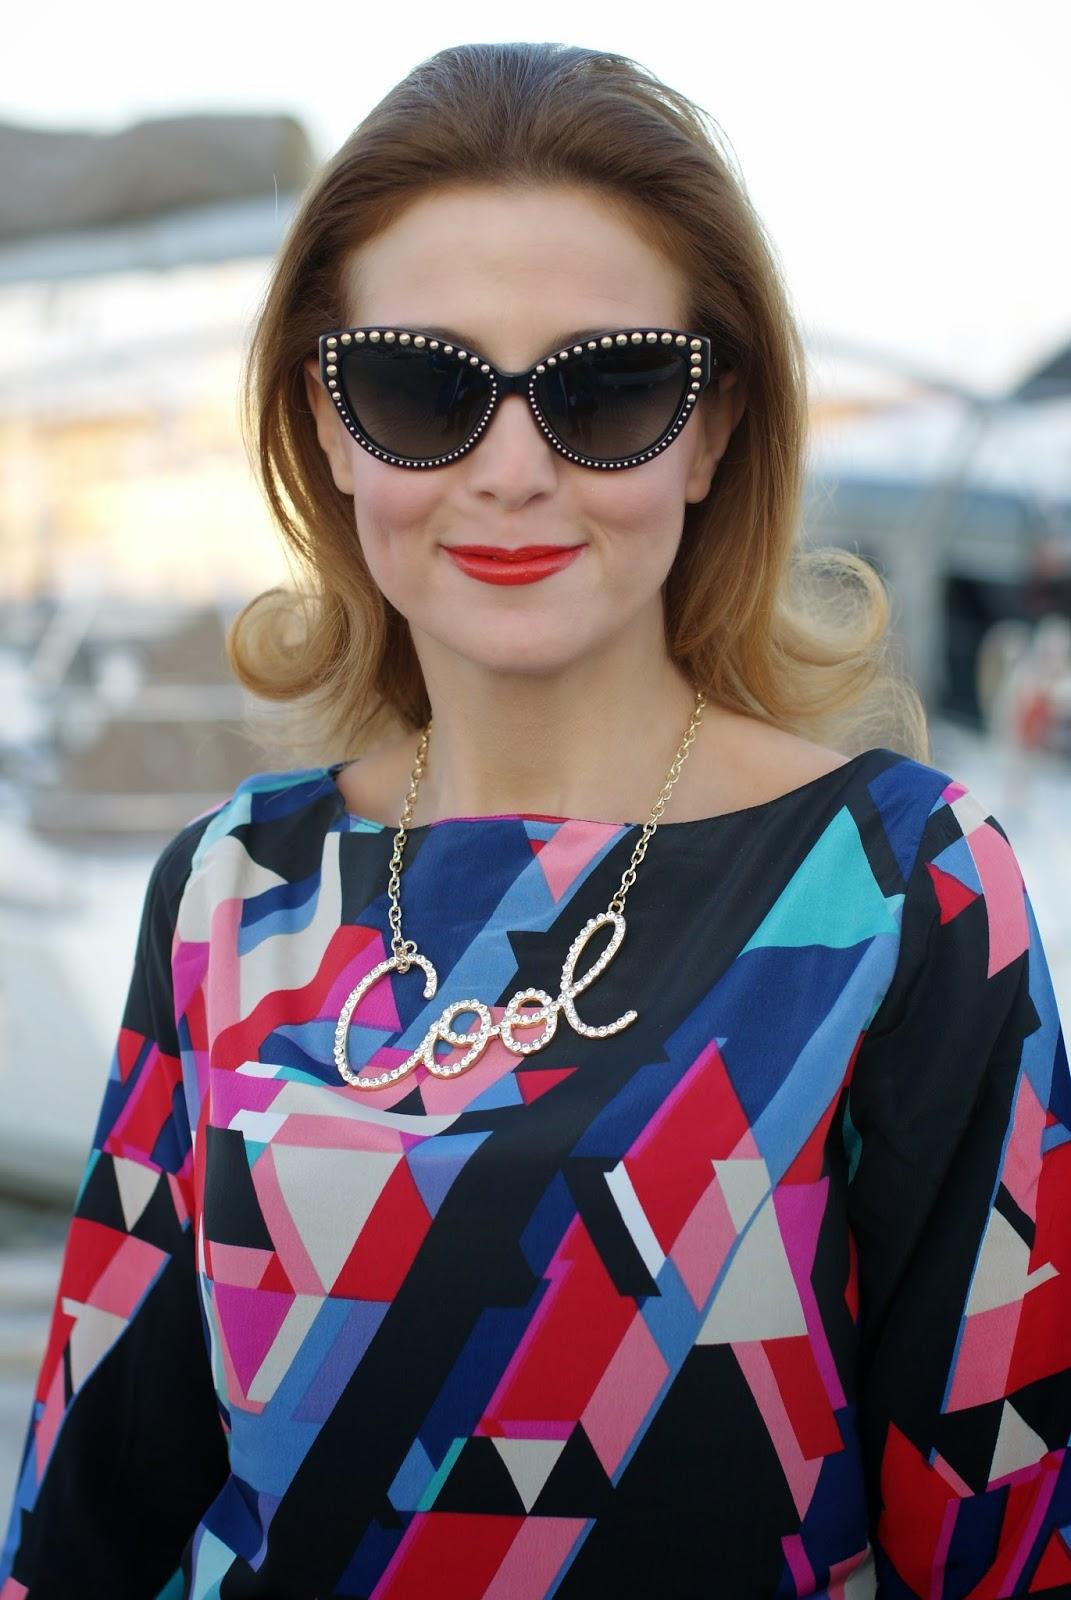 Paramita geometric print dress with Moschino studded cat eye sunglasses on Fashion and Cookies fashion blog